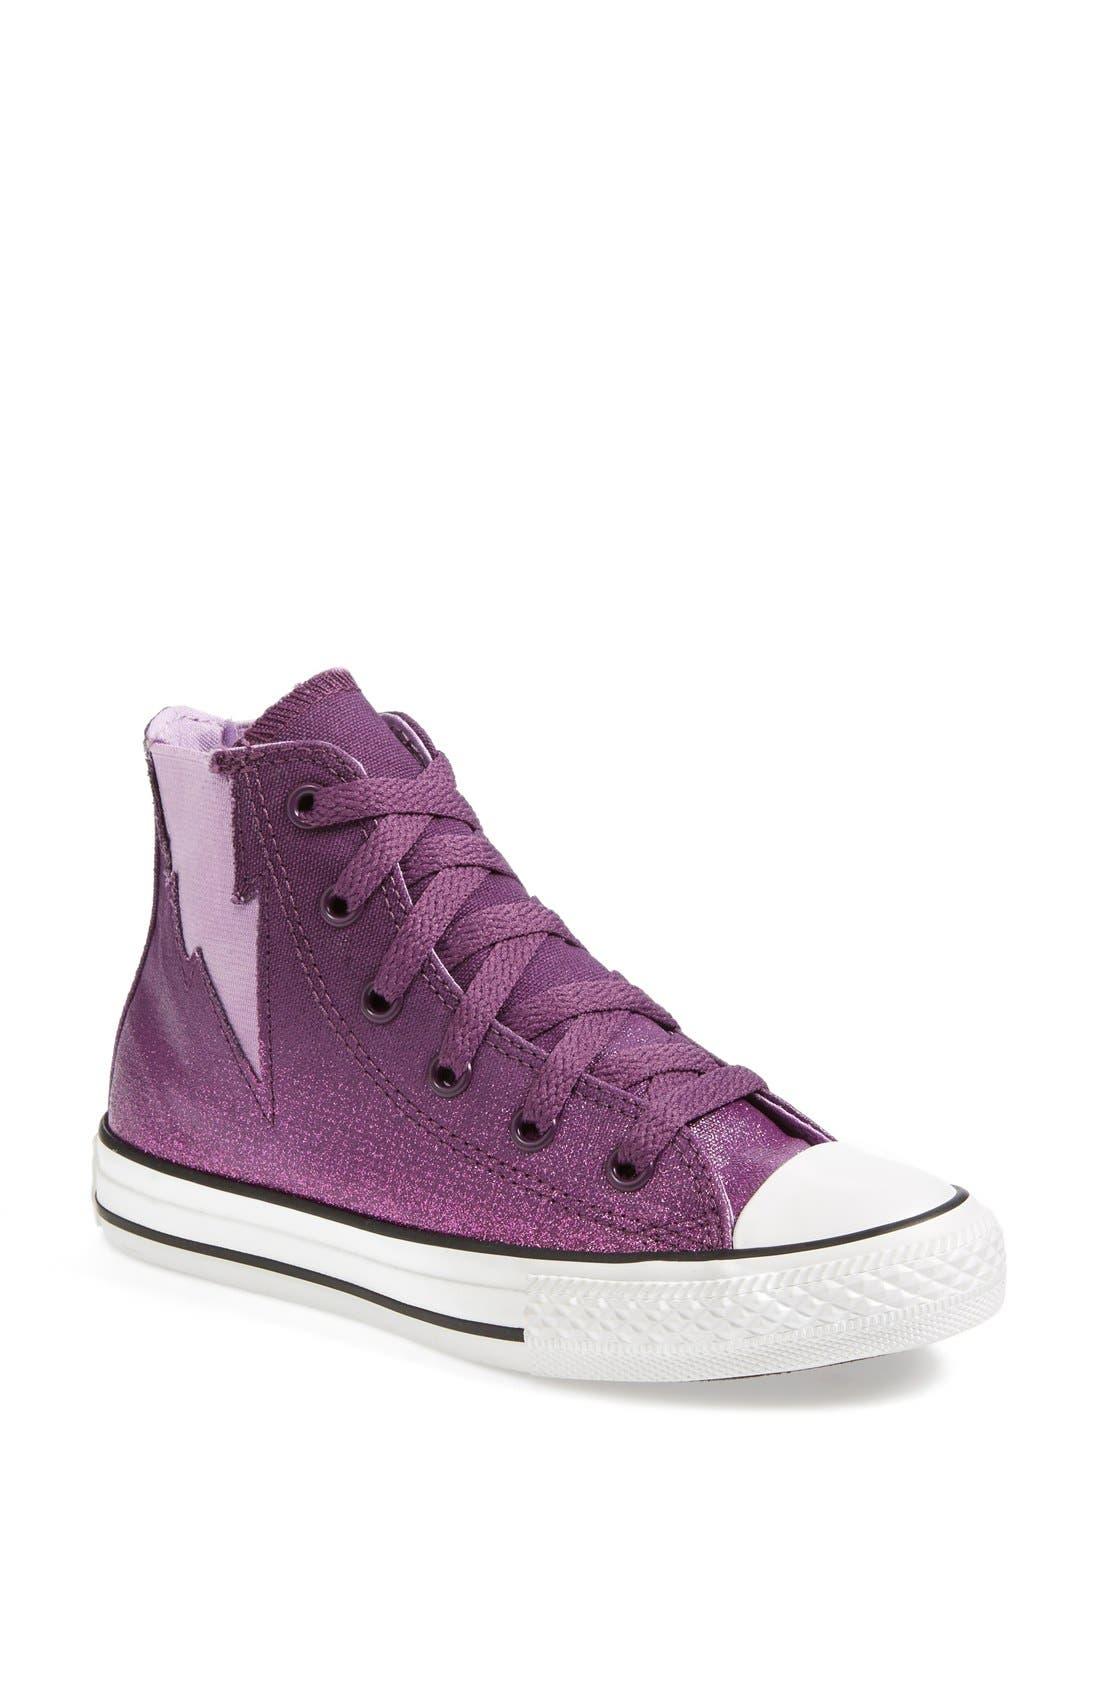 Main Image - Converse Chuck Taylor® All Star® 'Sparkle Wash Boltz' High Top Sneaker (Toddler, Little Kid & Big Kid)